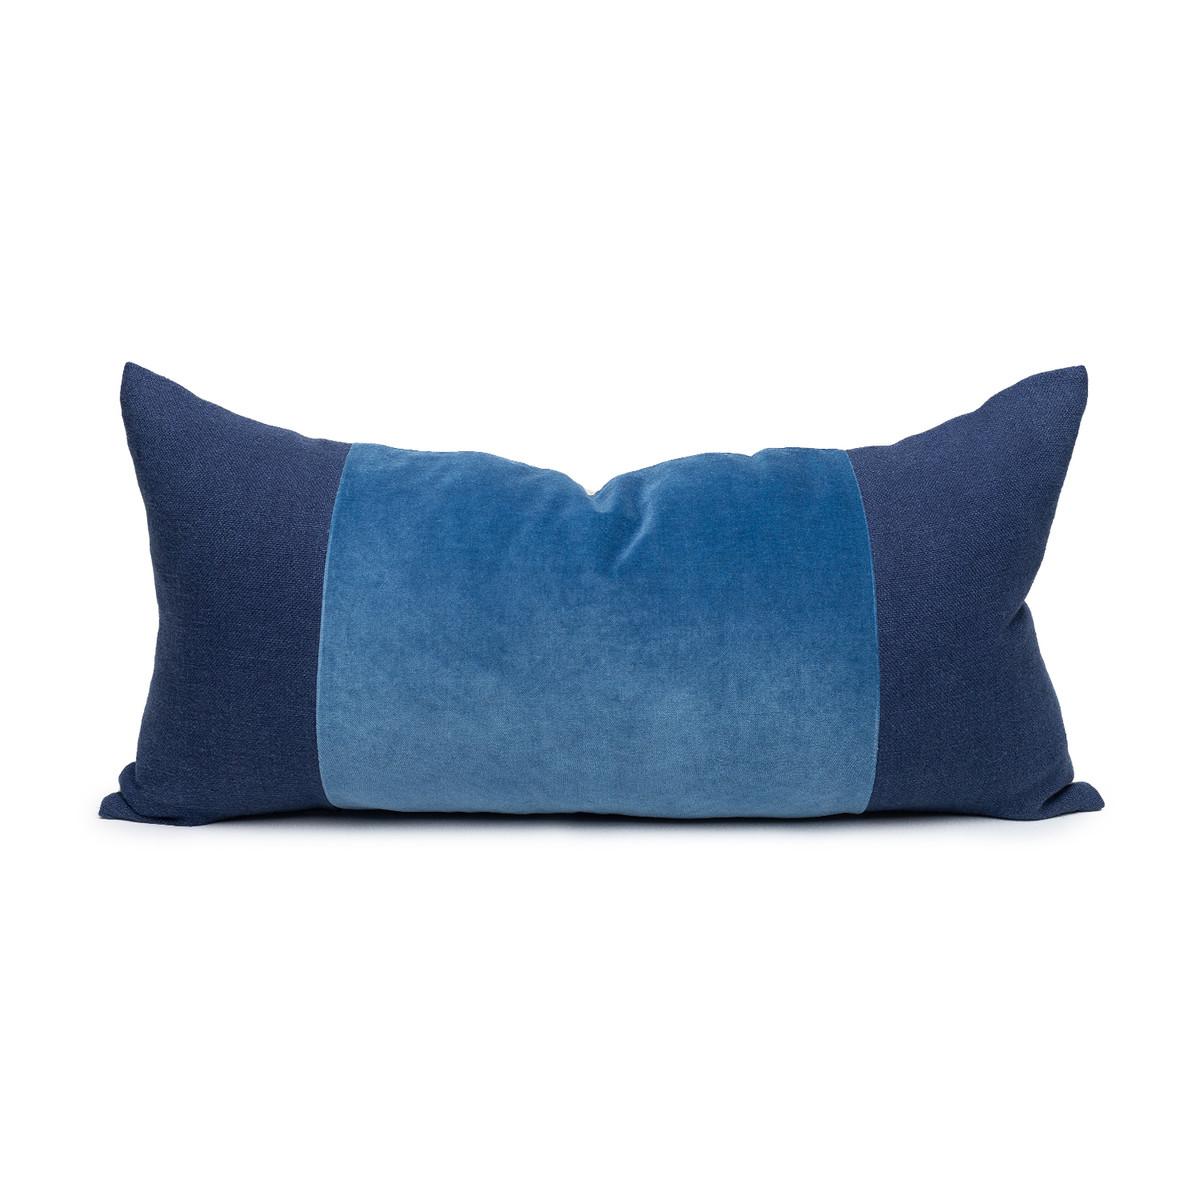 Chante Kyanite Velvet Lumbar Pillow - Front